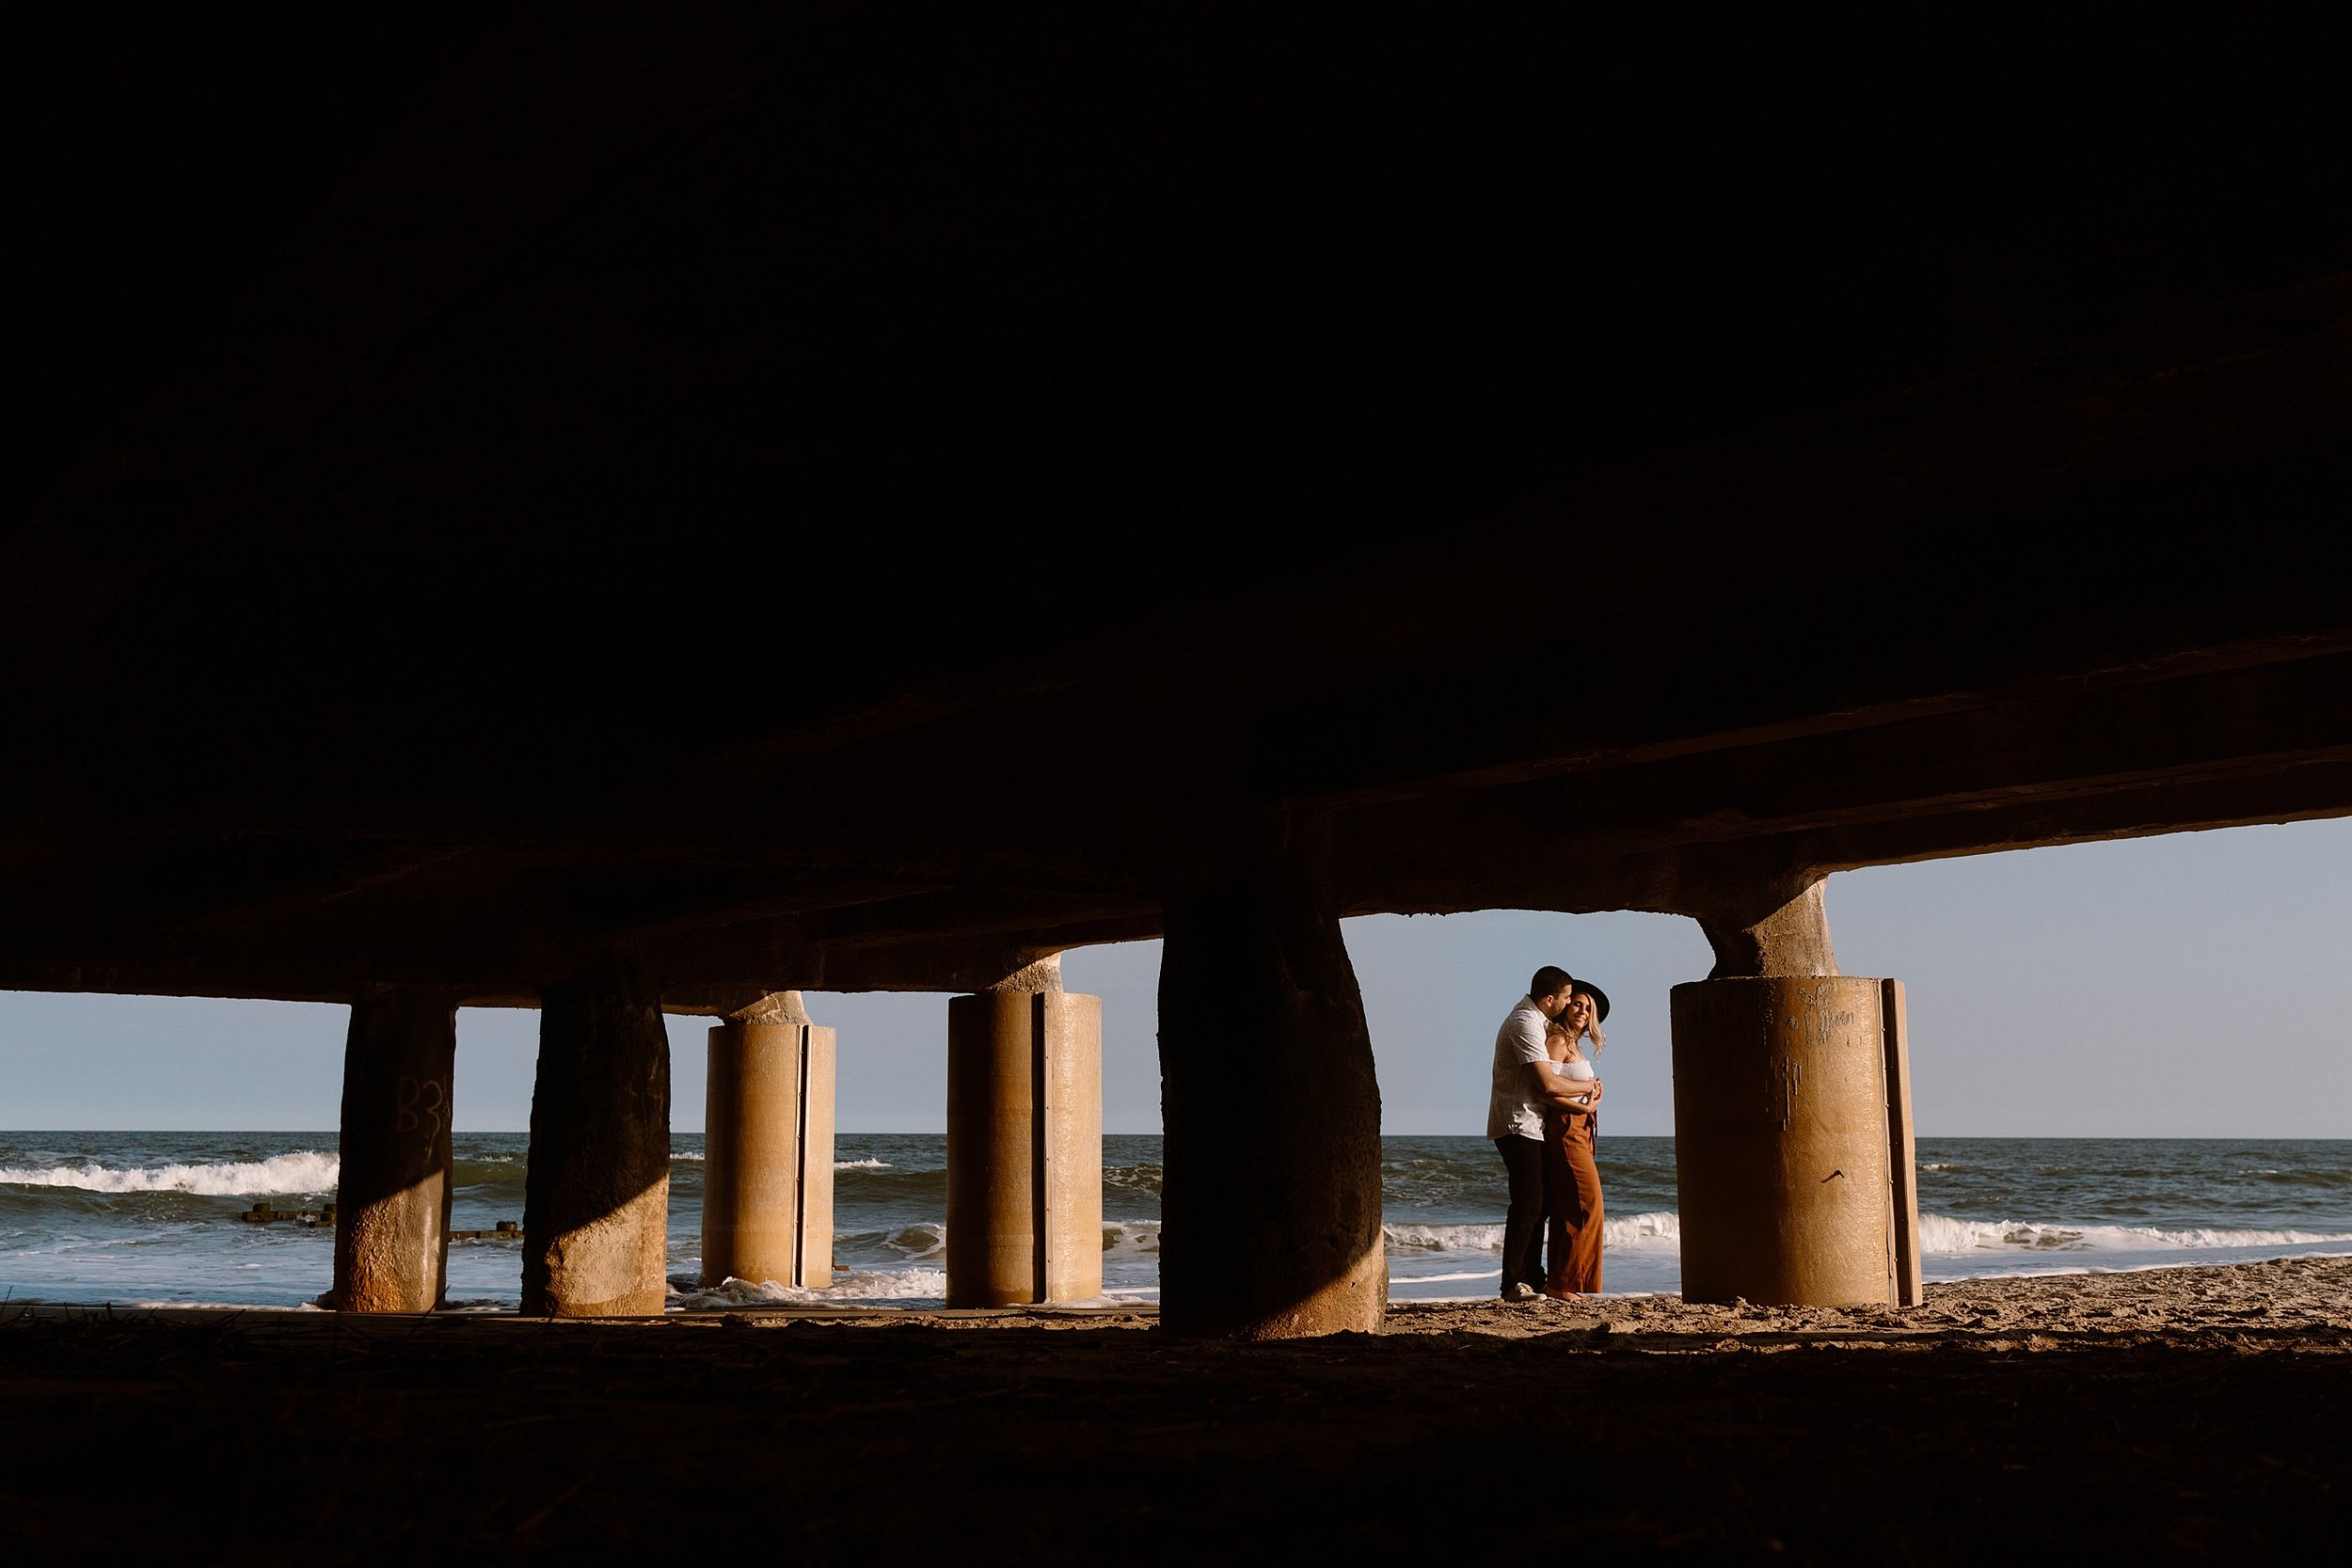 ocean-city-nj-engagement-photos-11.jpg